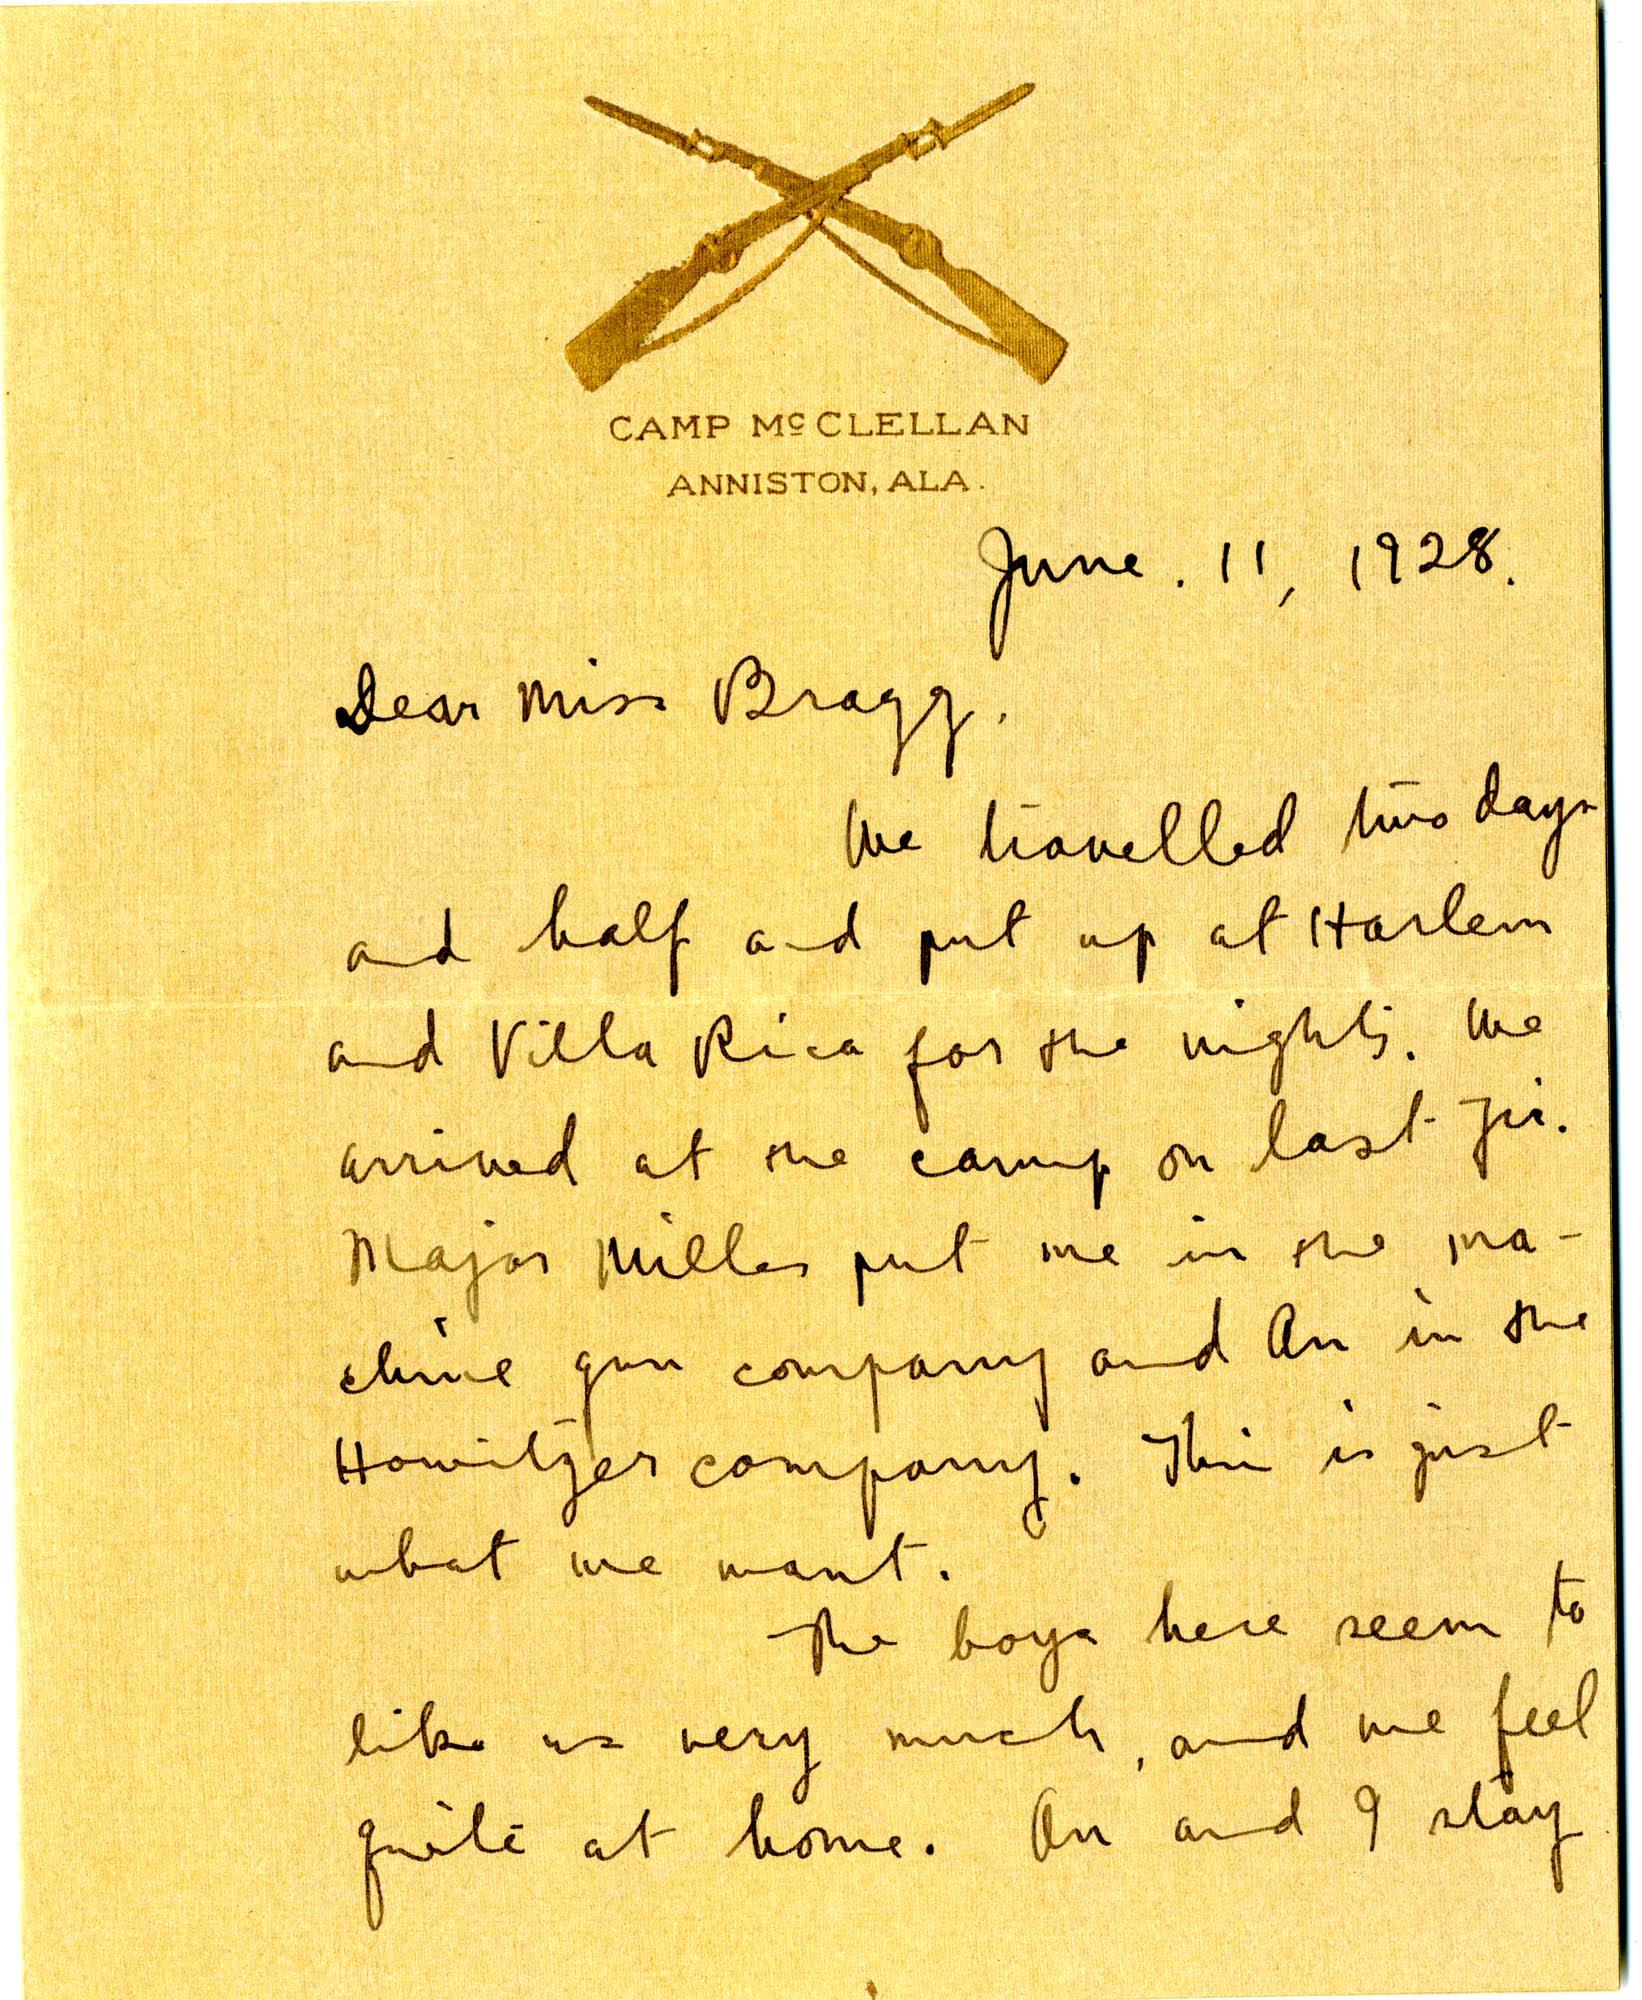 Letter from C.C. Tseng to Laura M. Bragg, June 11, 1928